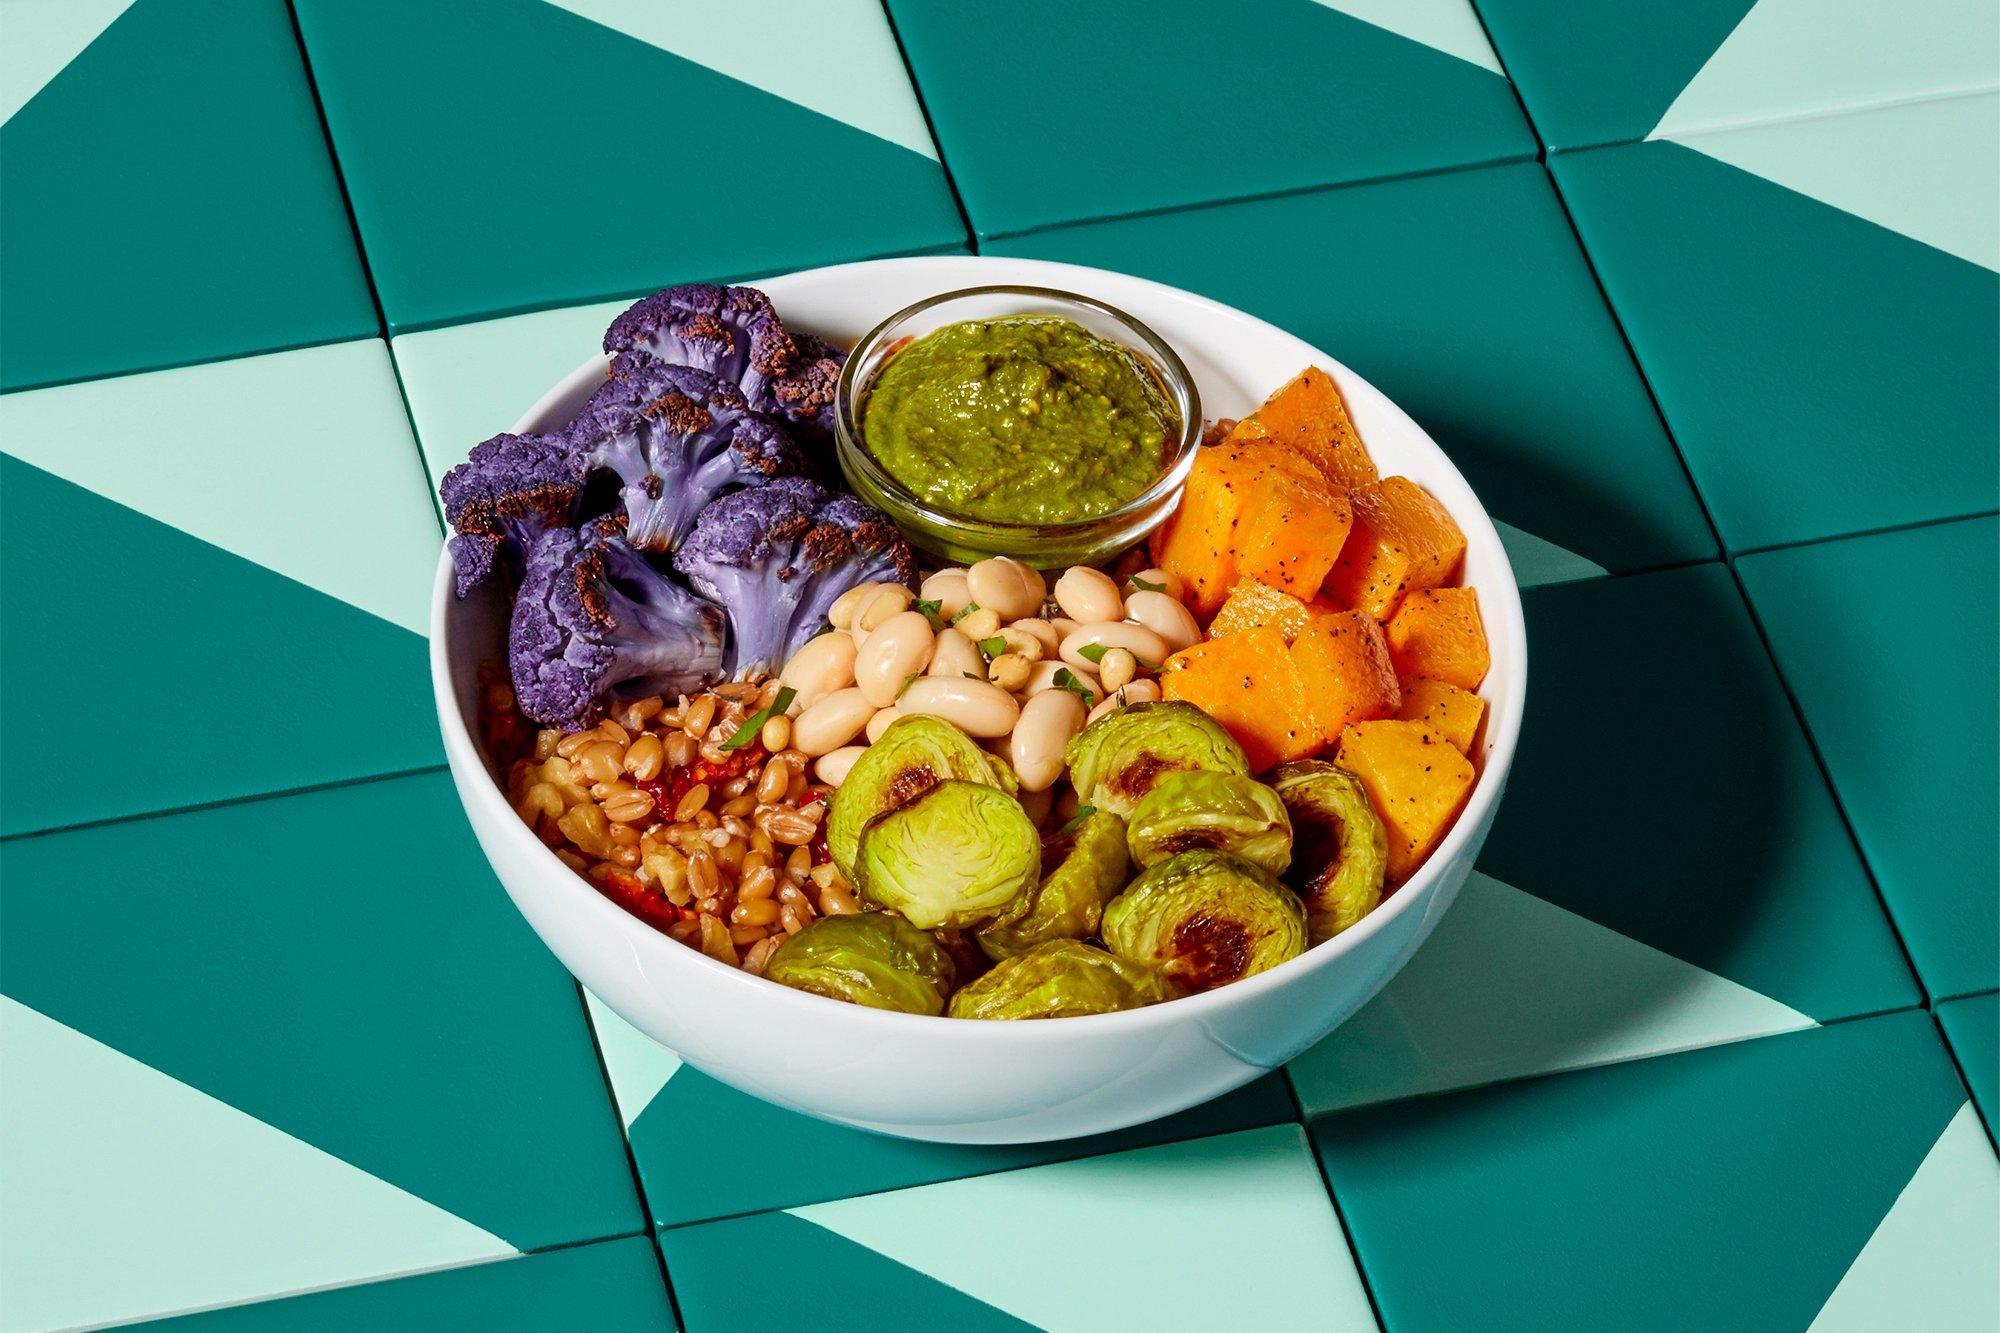 4. Mosaic Foods, US-1